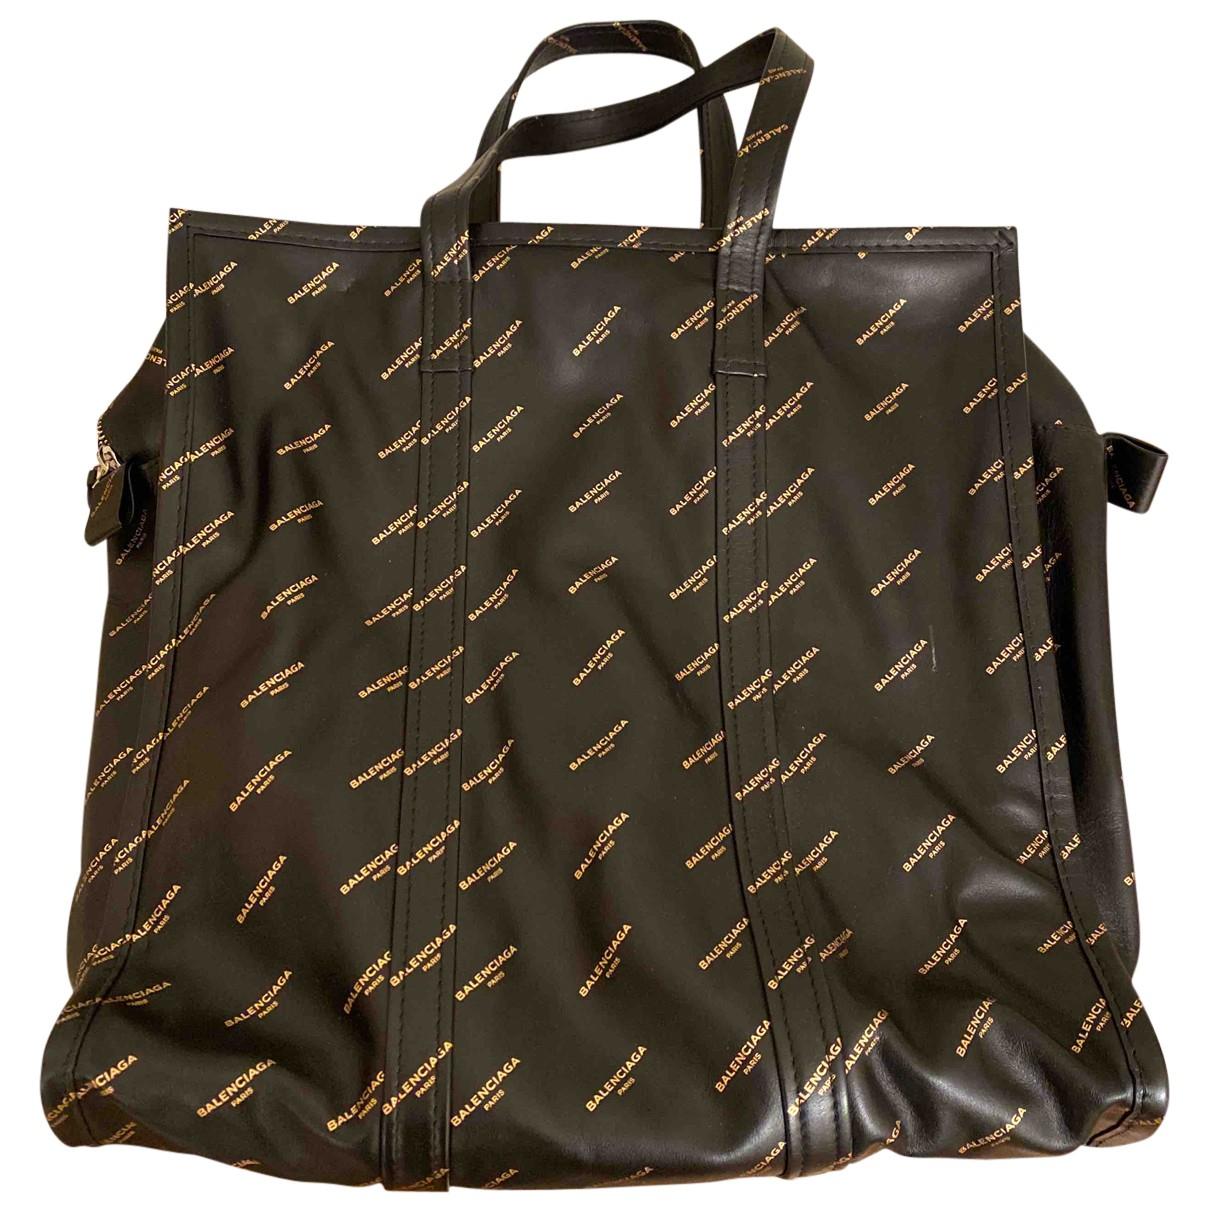 Balenciaga - Sac a main Bazar Bag pour femme en cuir - noir